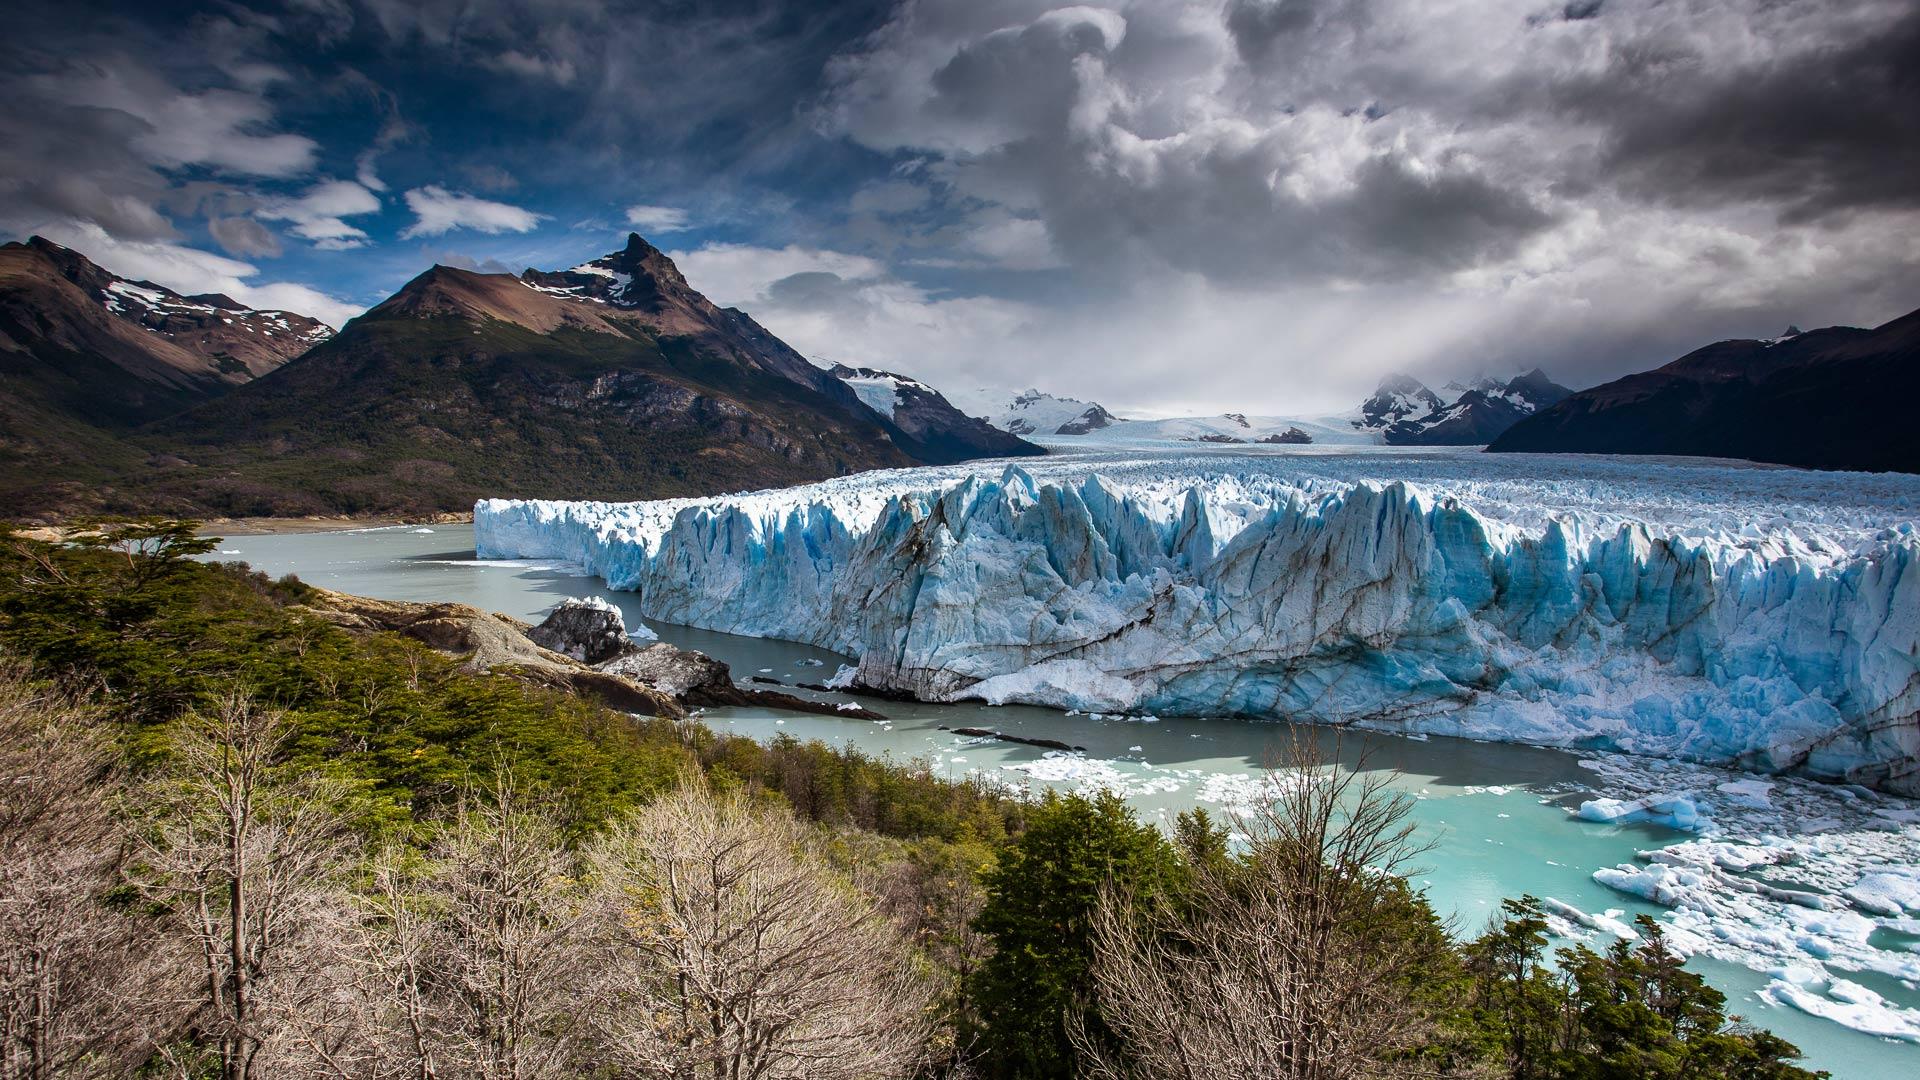 glacier wallpaper background